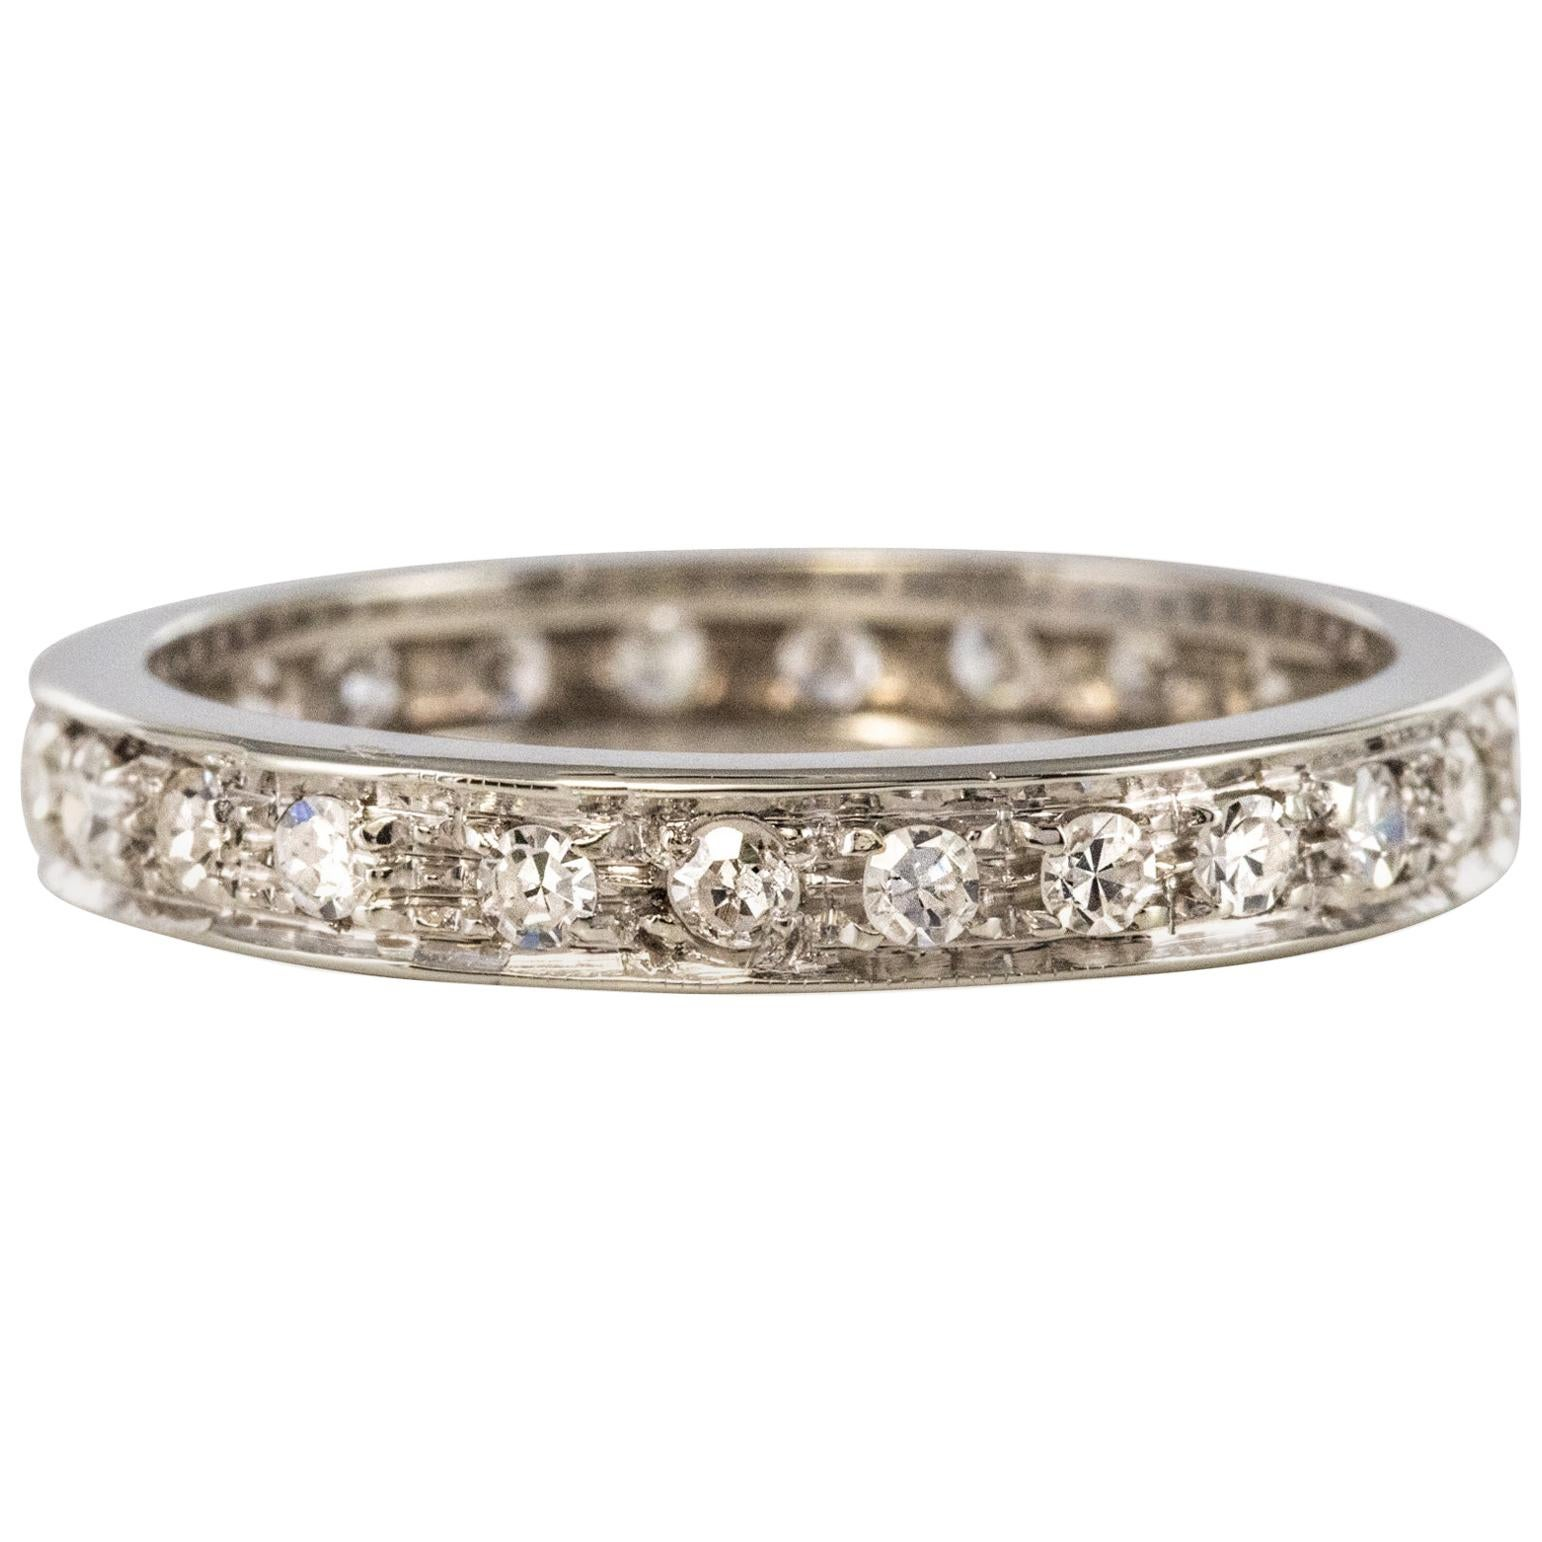 French 1950s Diamonds 18 Karat White Gold Wedding Ring